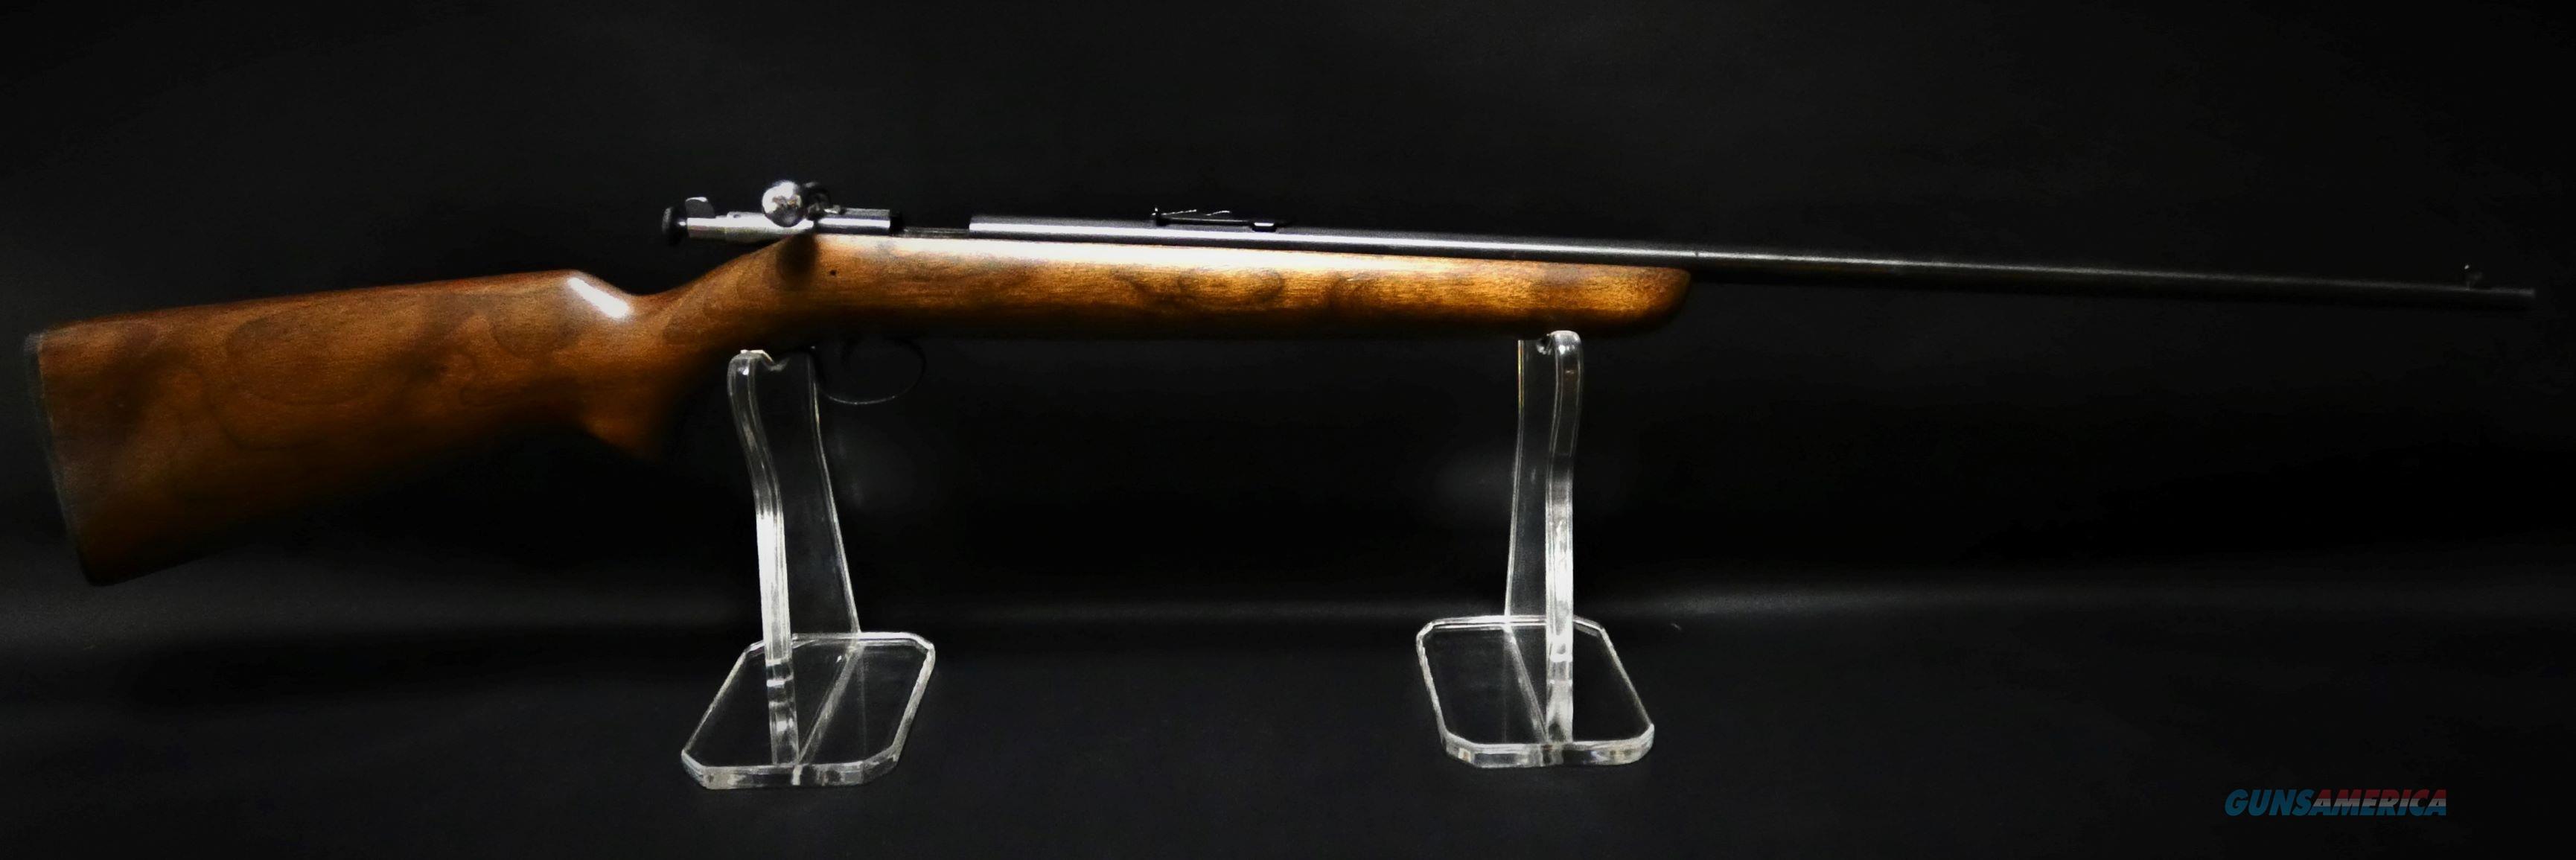 Winchester Model 67A Single Shot Bolt Action Rifle .22 L,LR  Guns > Rifles > Winchester Rifles - Modern Bolt/Auto/Single > Single Shot